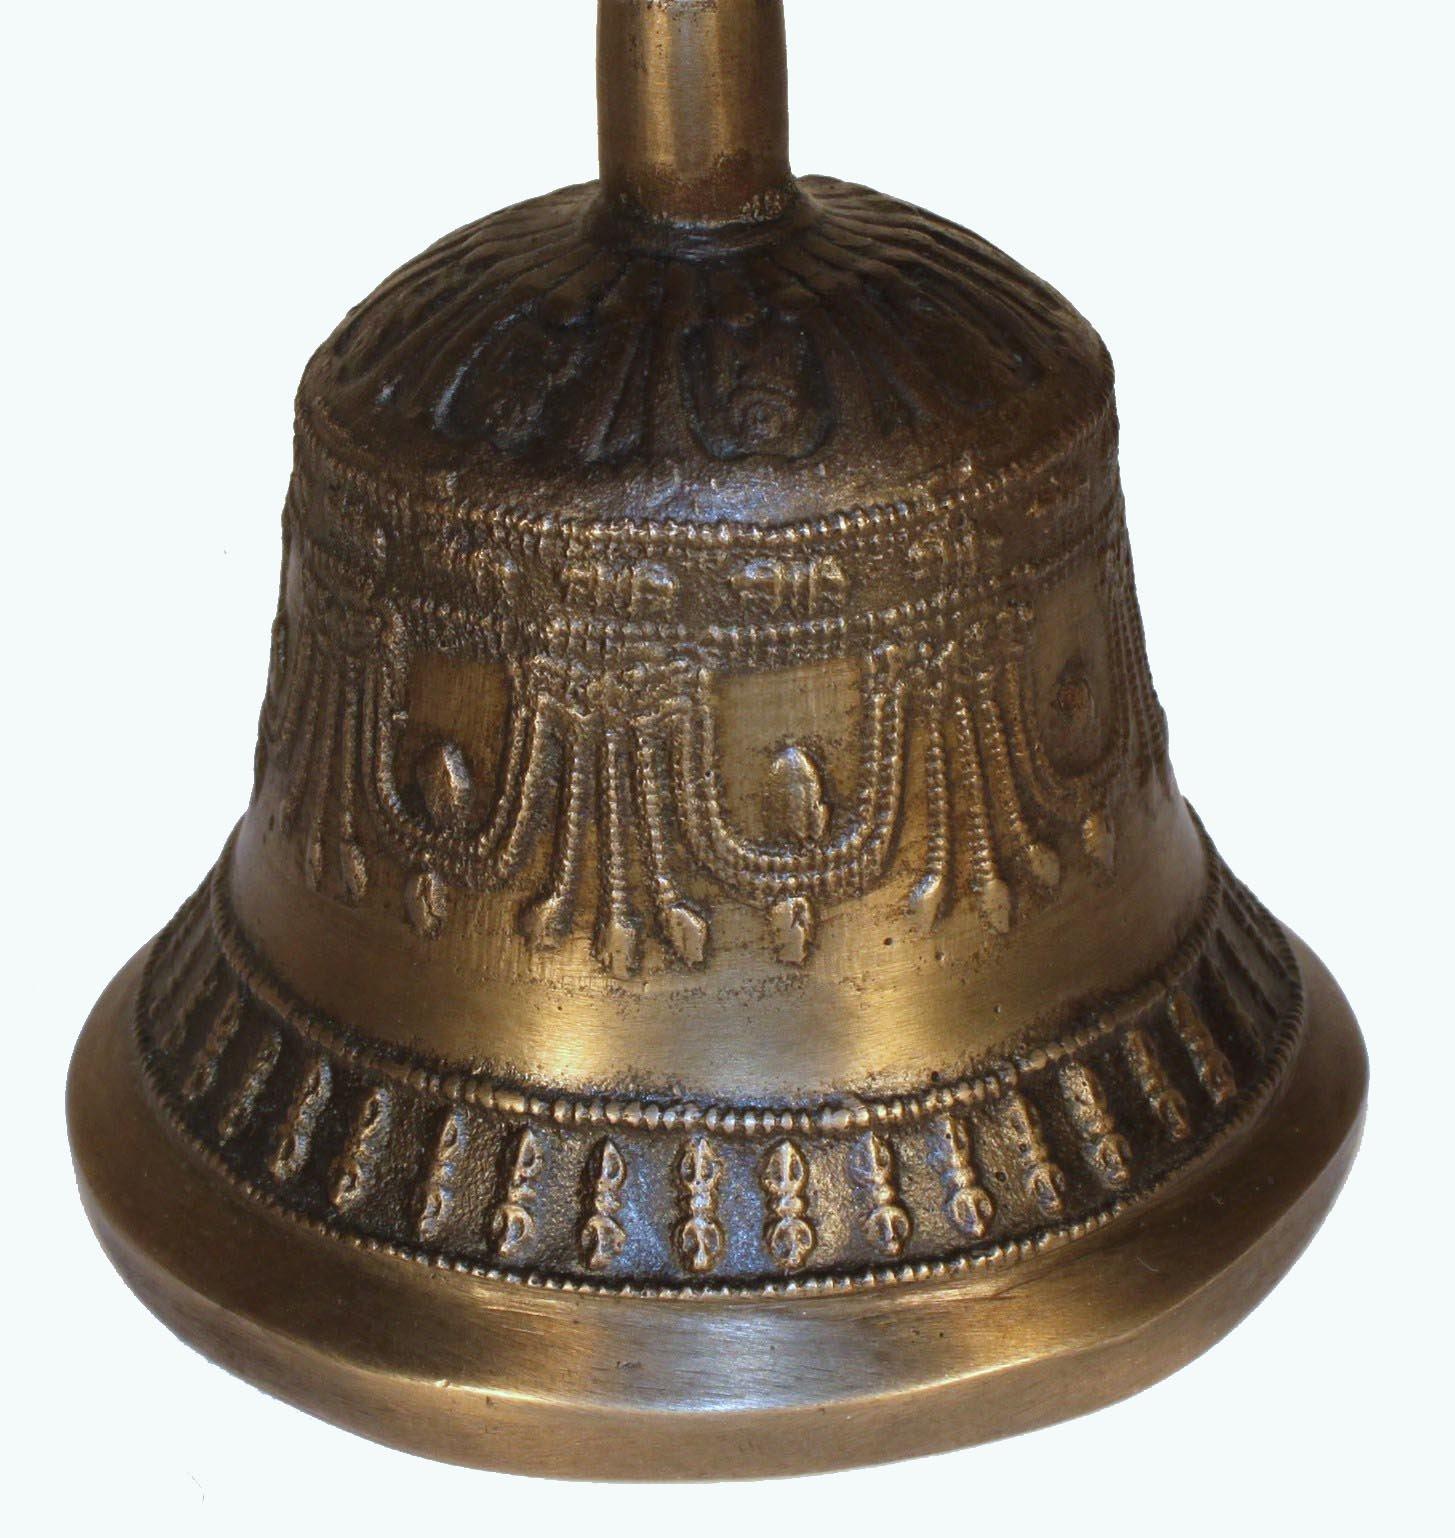 Antique Bell / Tibetan Meditation Bell / Tibetan / Multi-Layered Harmonics / Meditation Tool by Tibetan (Image #3)